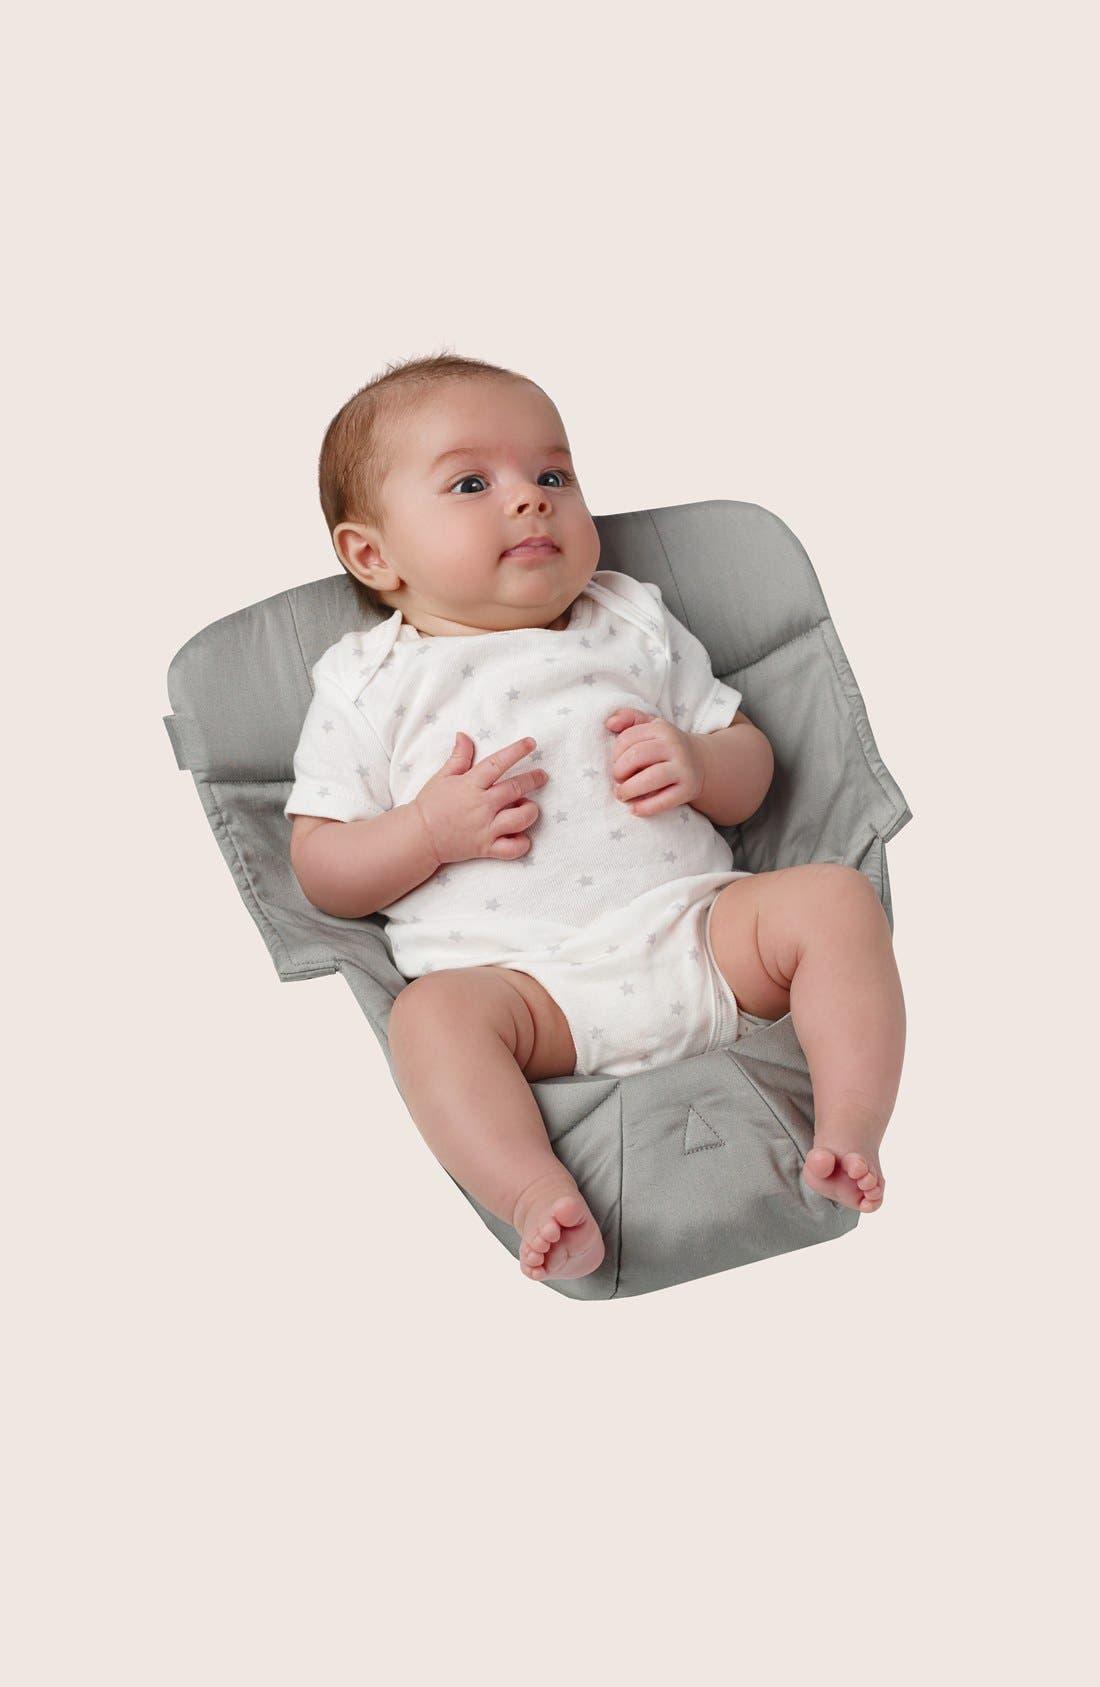 'Easy Snug' Cotton Poplin Baby Insert,                             Main thumbnail 1, color,                             020